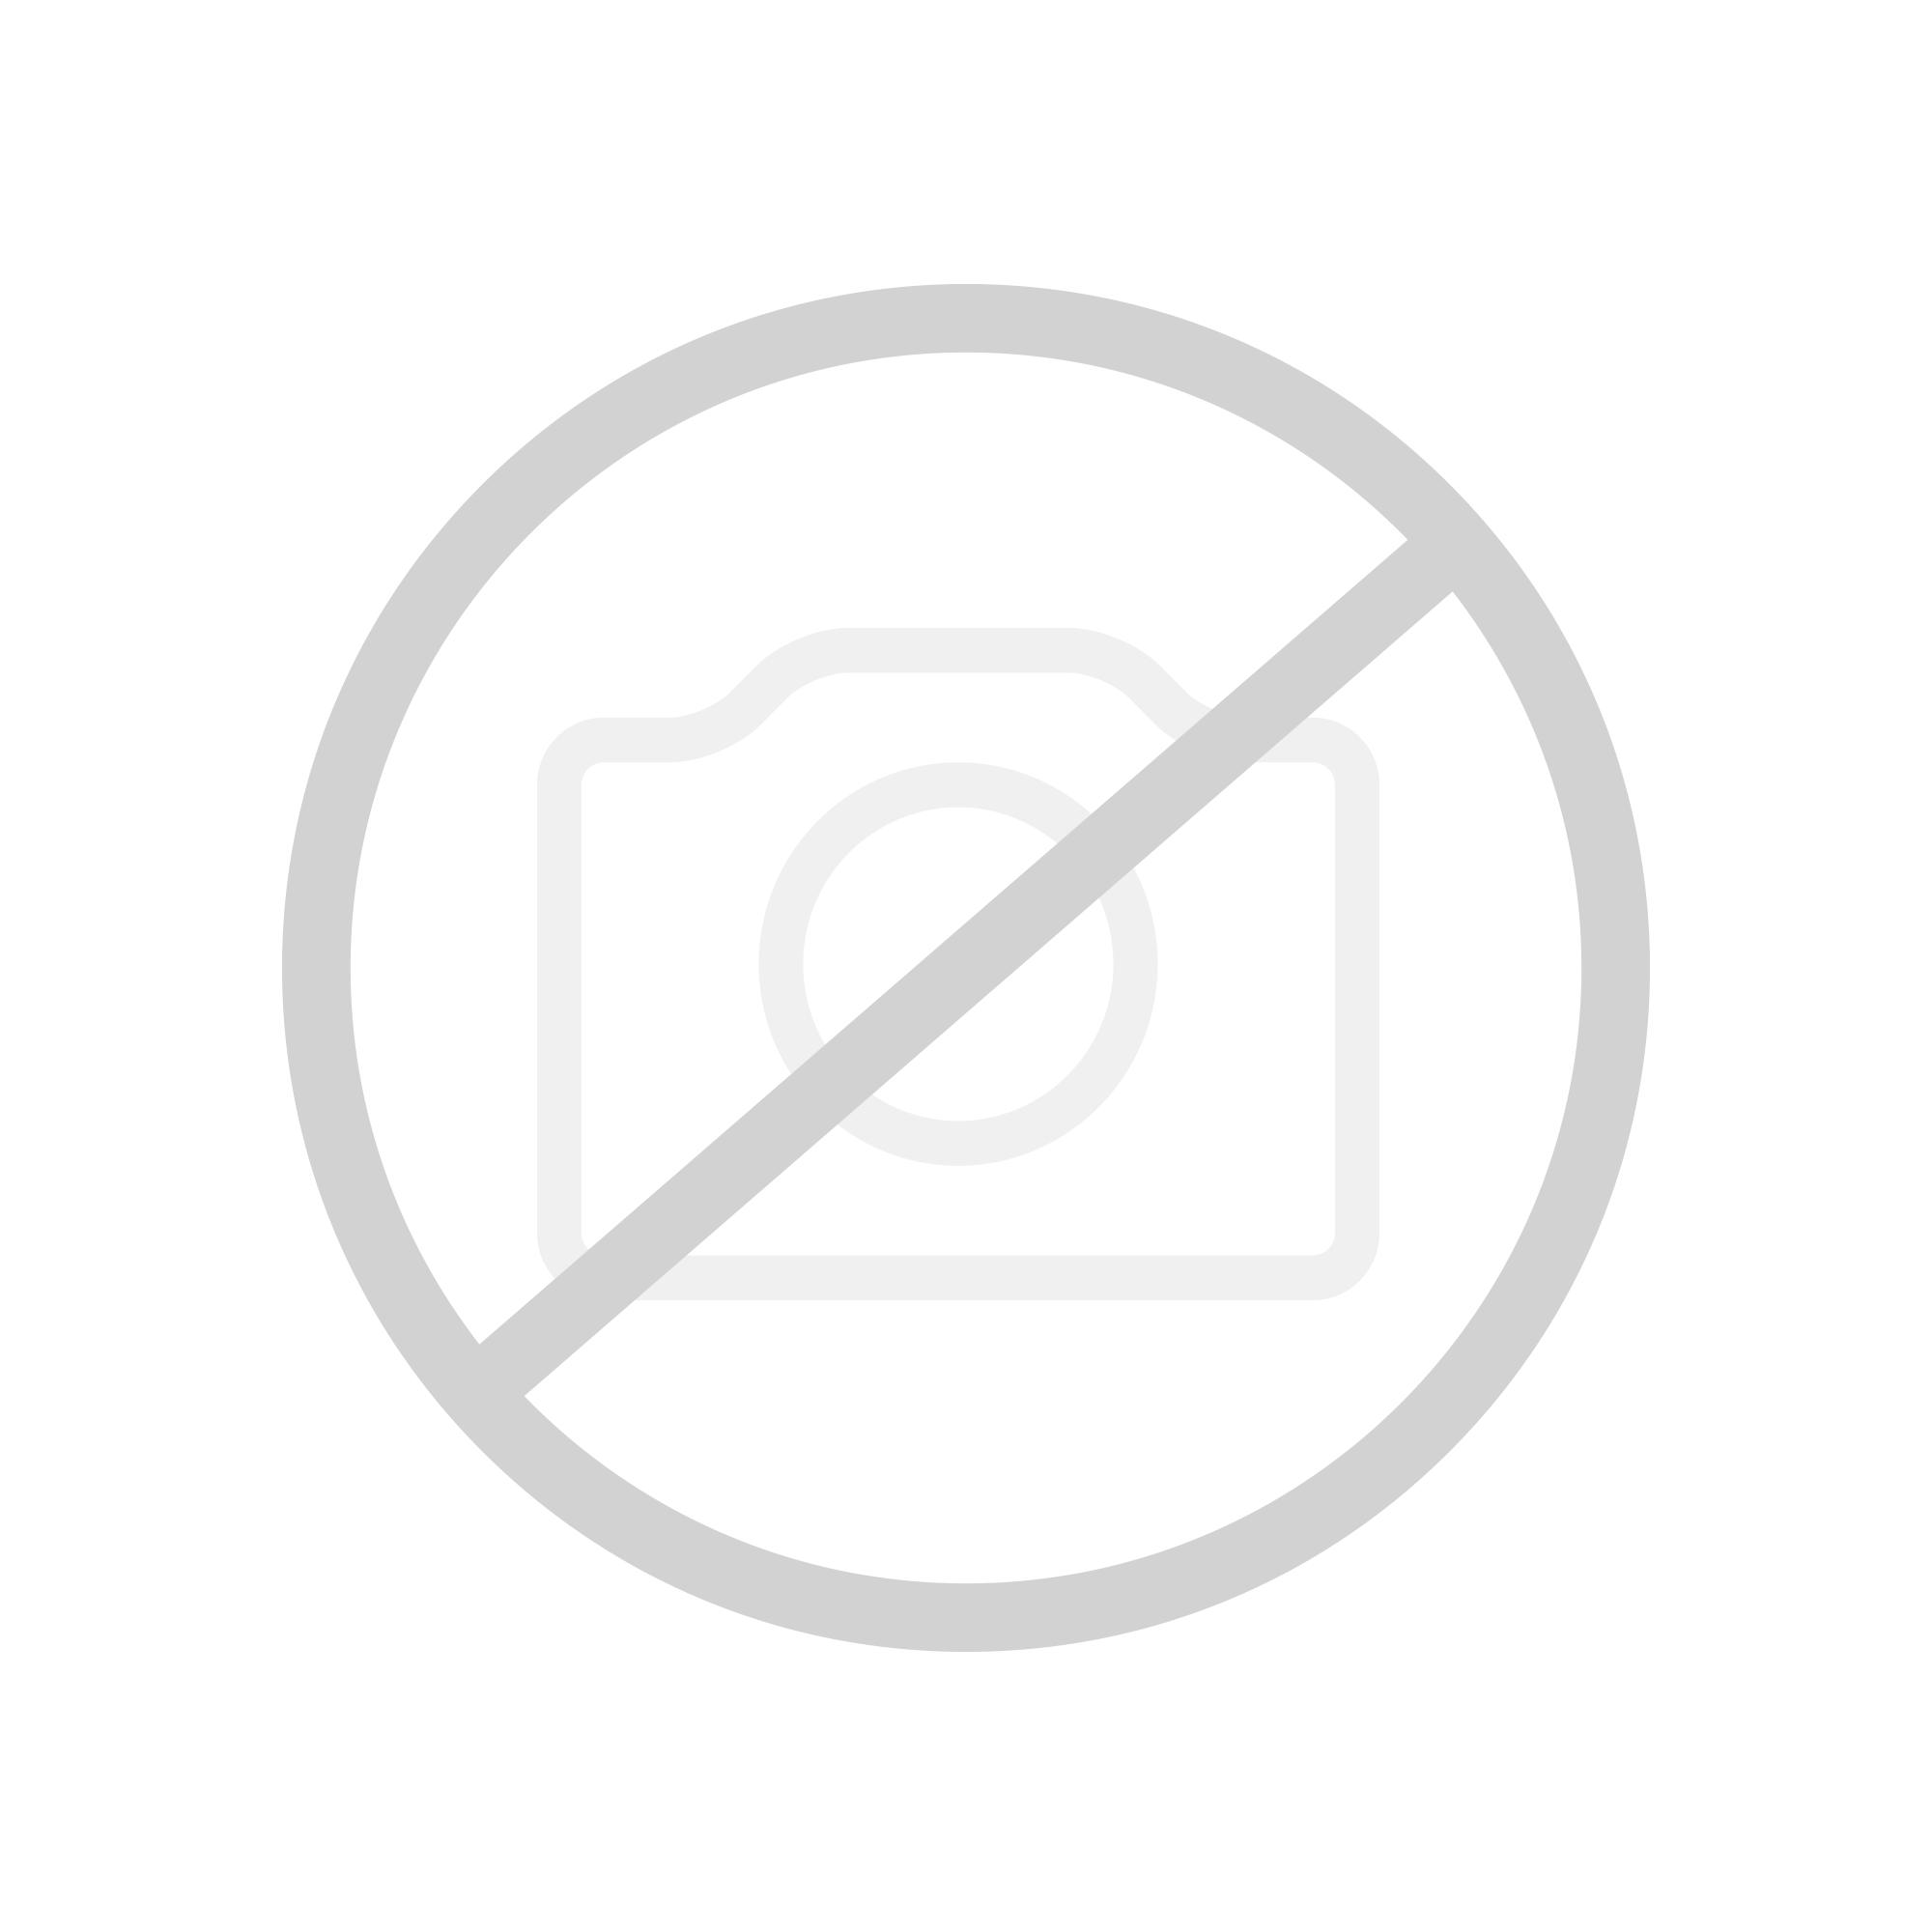 Victoria + Albert klassische Kette + Stöpsel Ablaufgarnitur chrom poliert